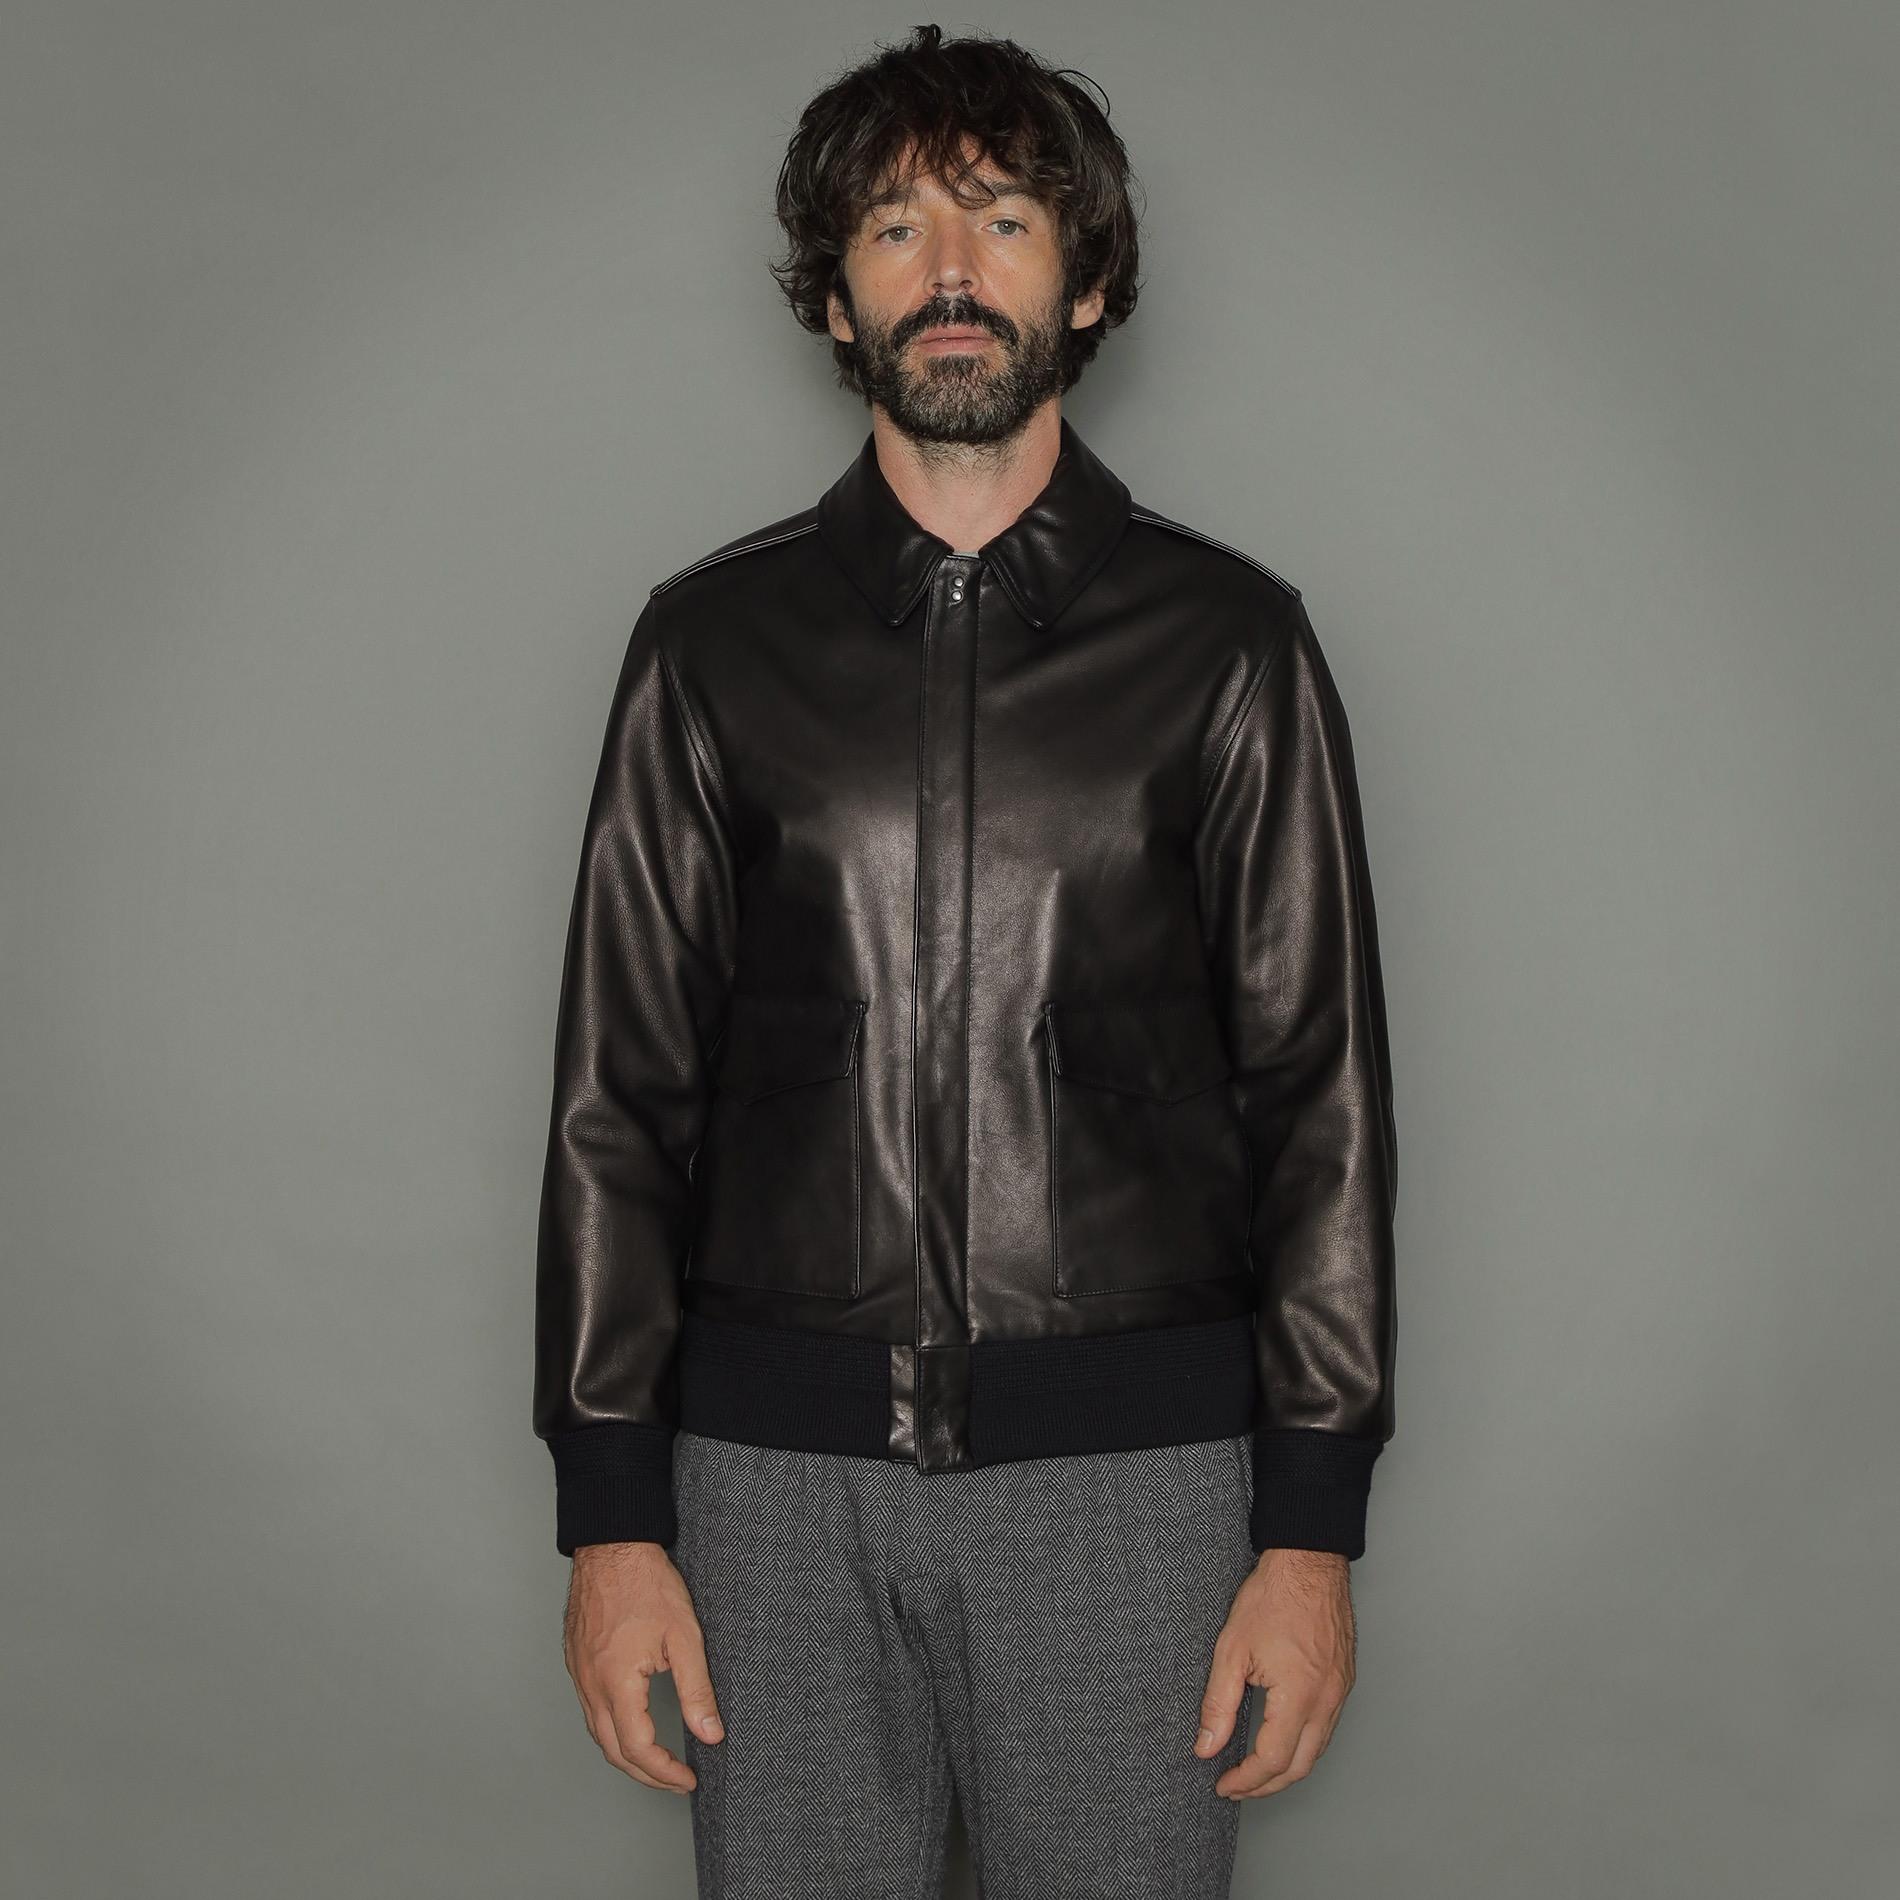 【Weatherproofed Leather】A-2ブルゾン